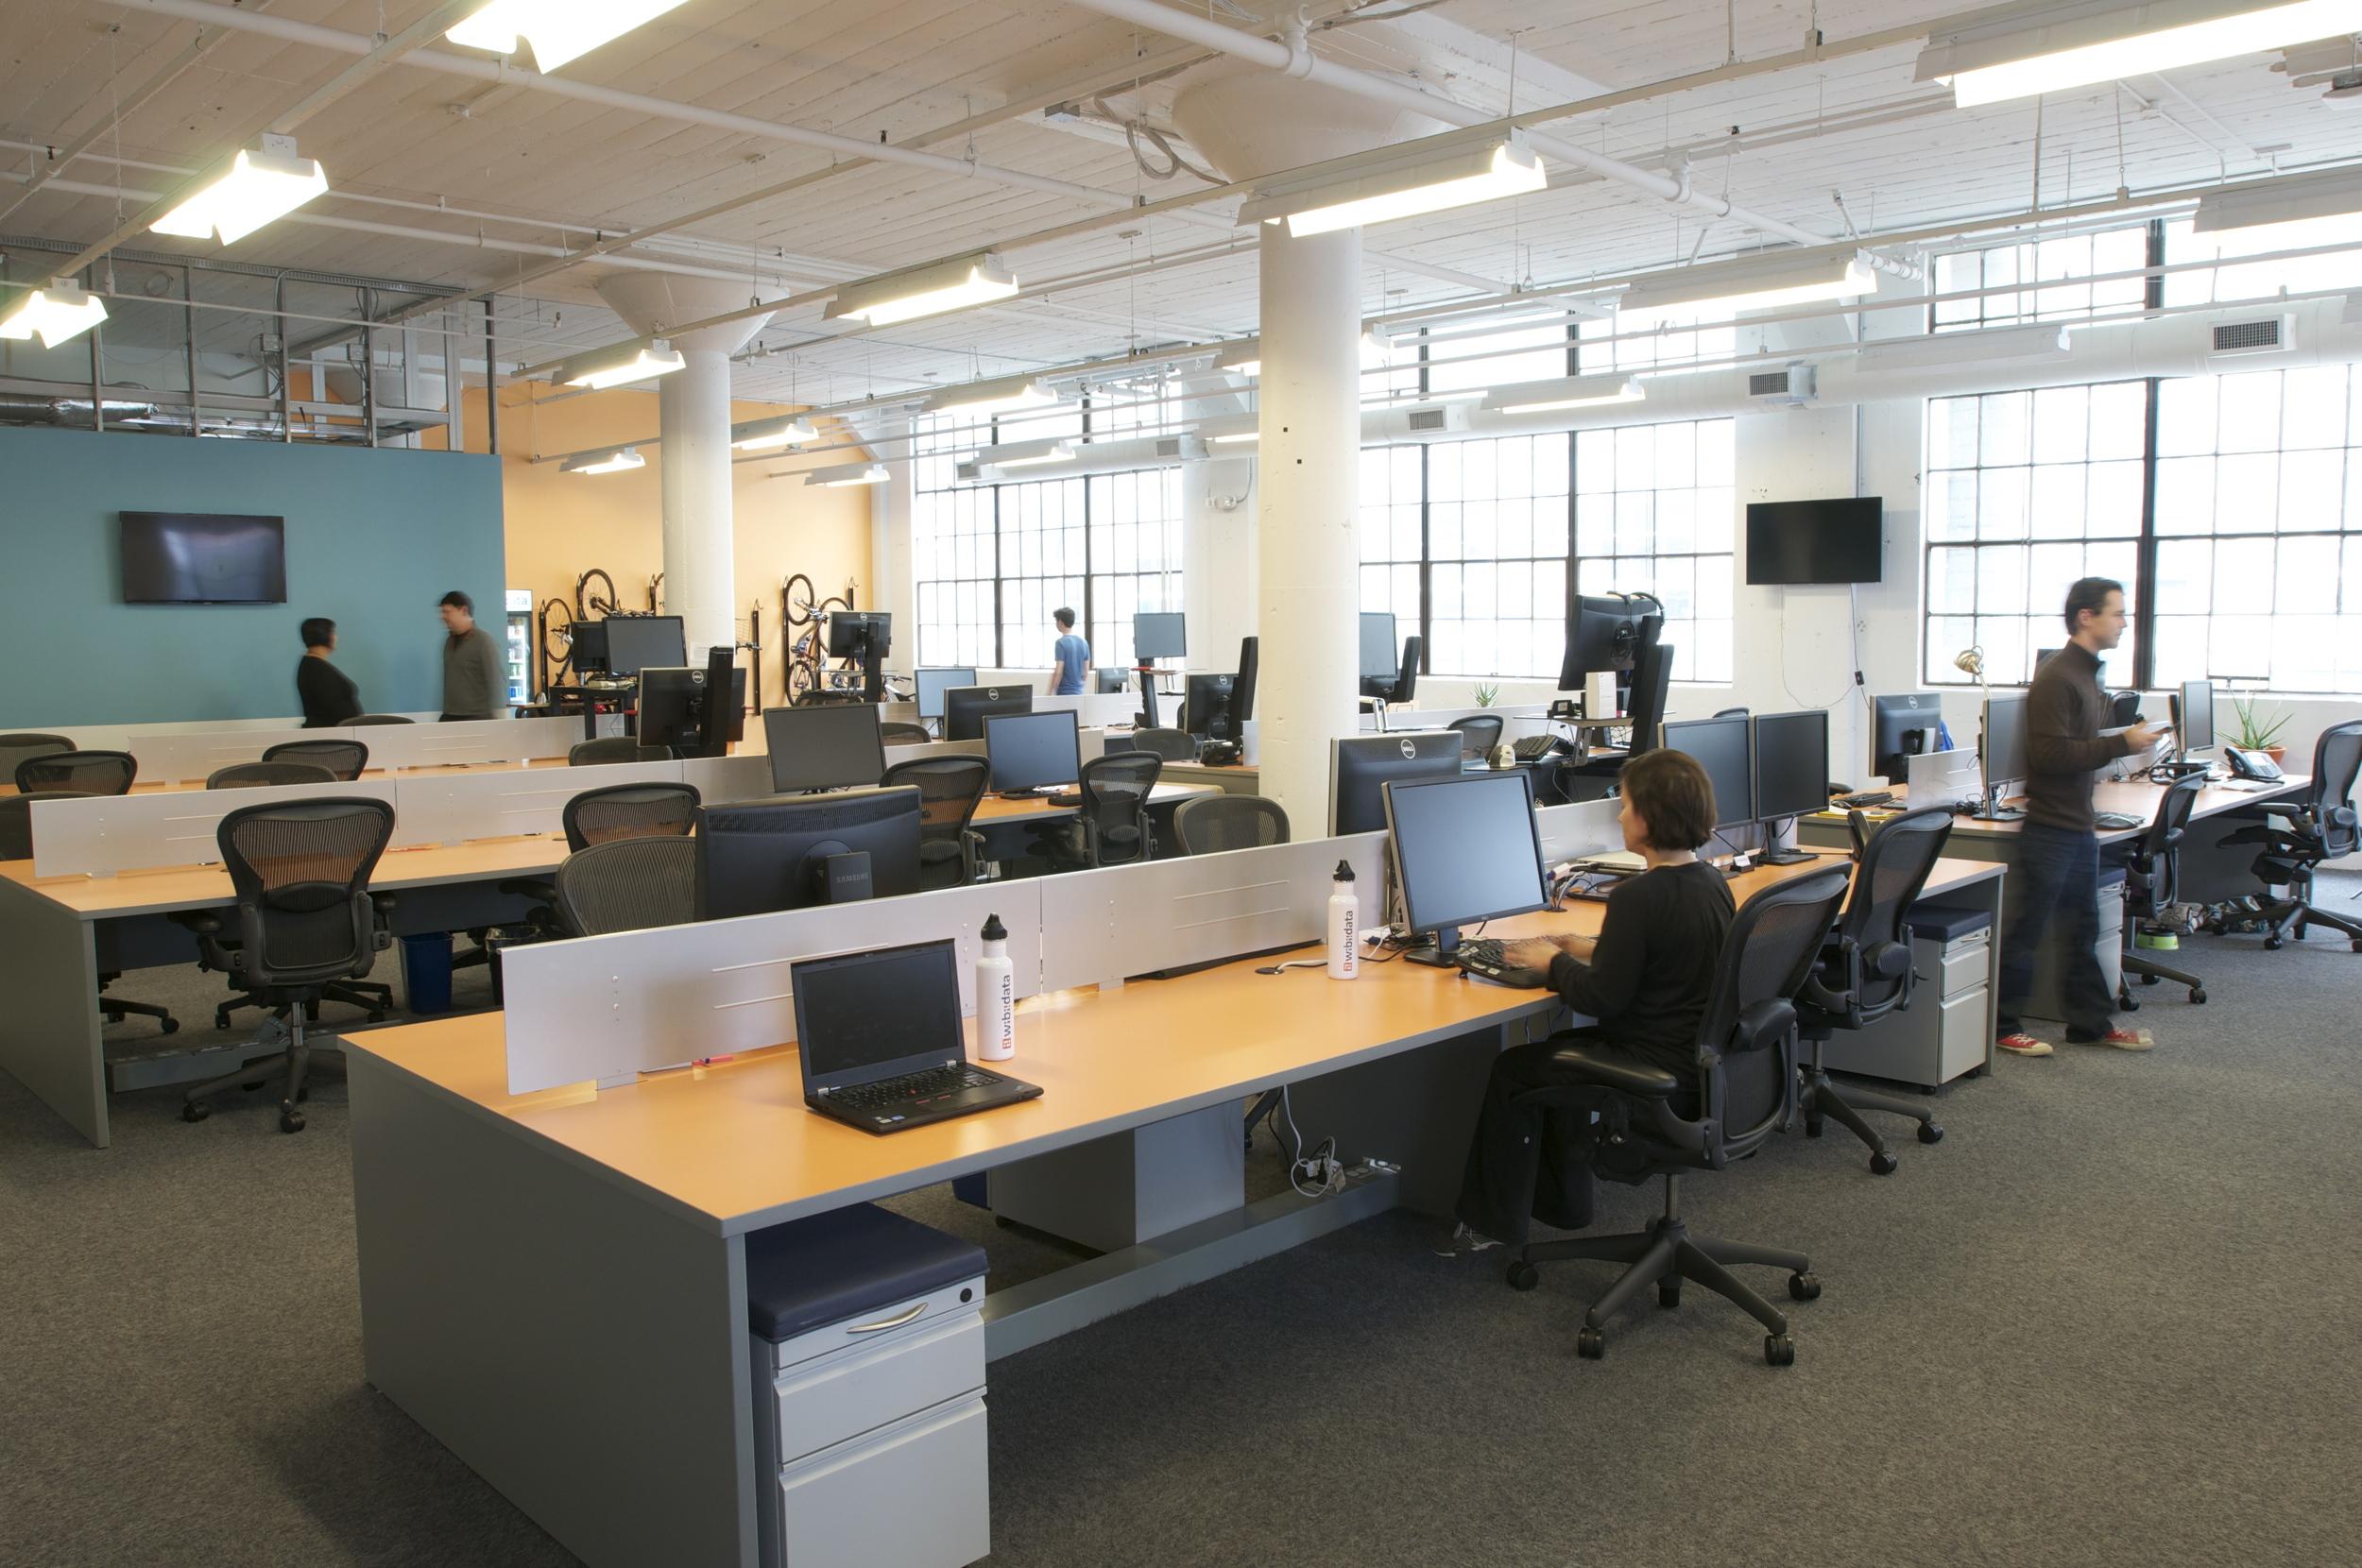 1_WibiData_Overall Office View.jpg